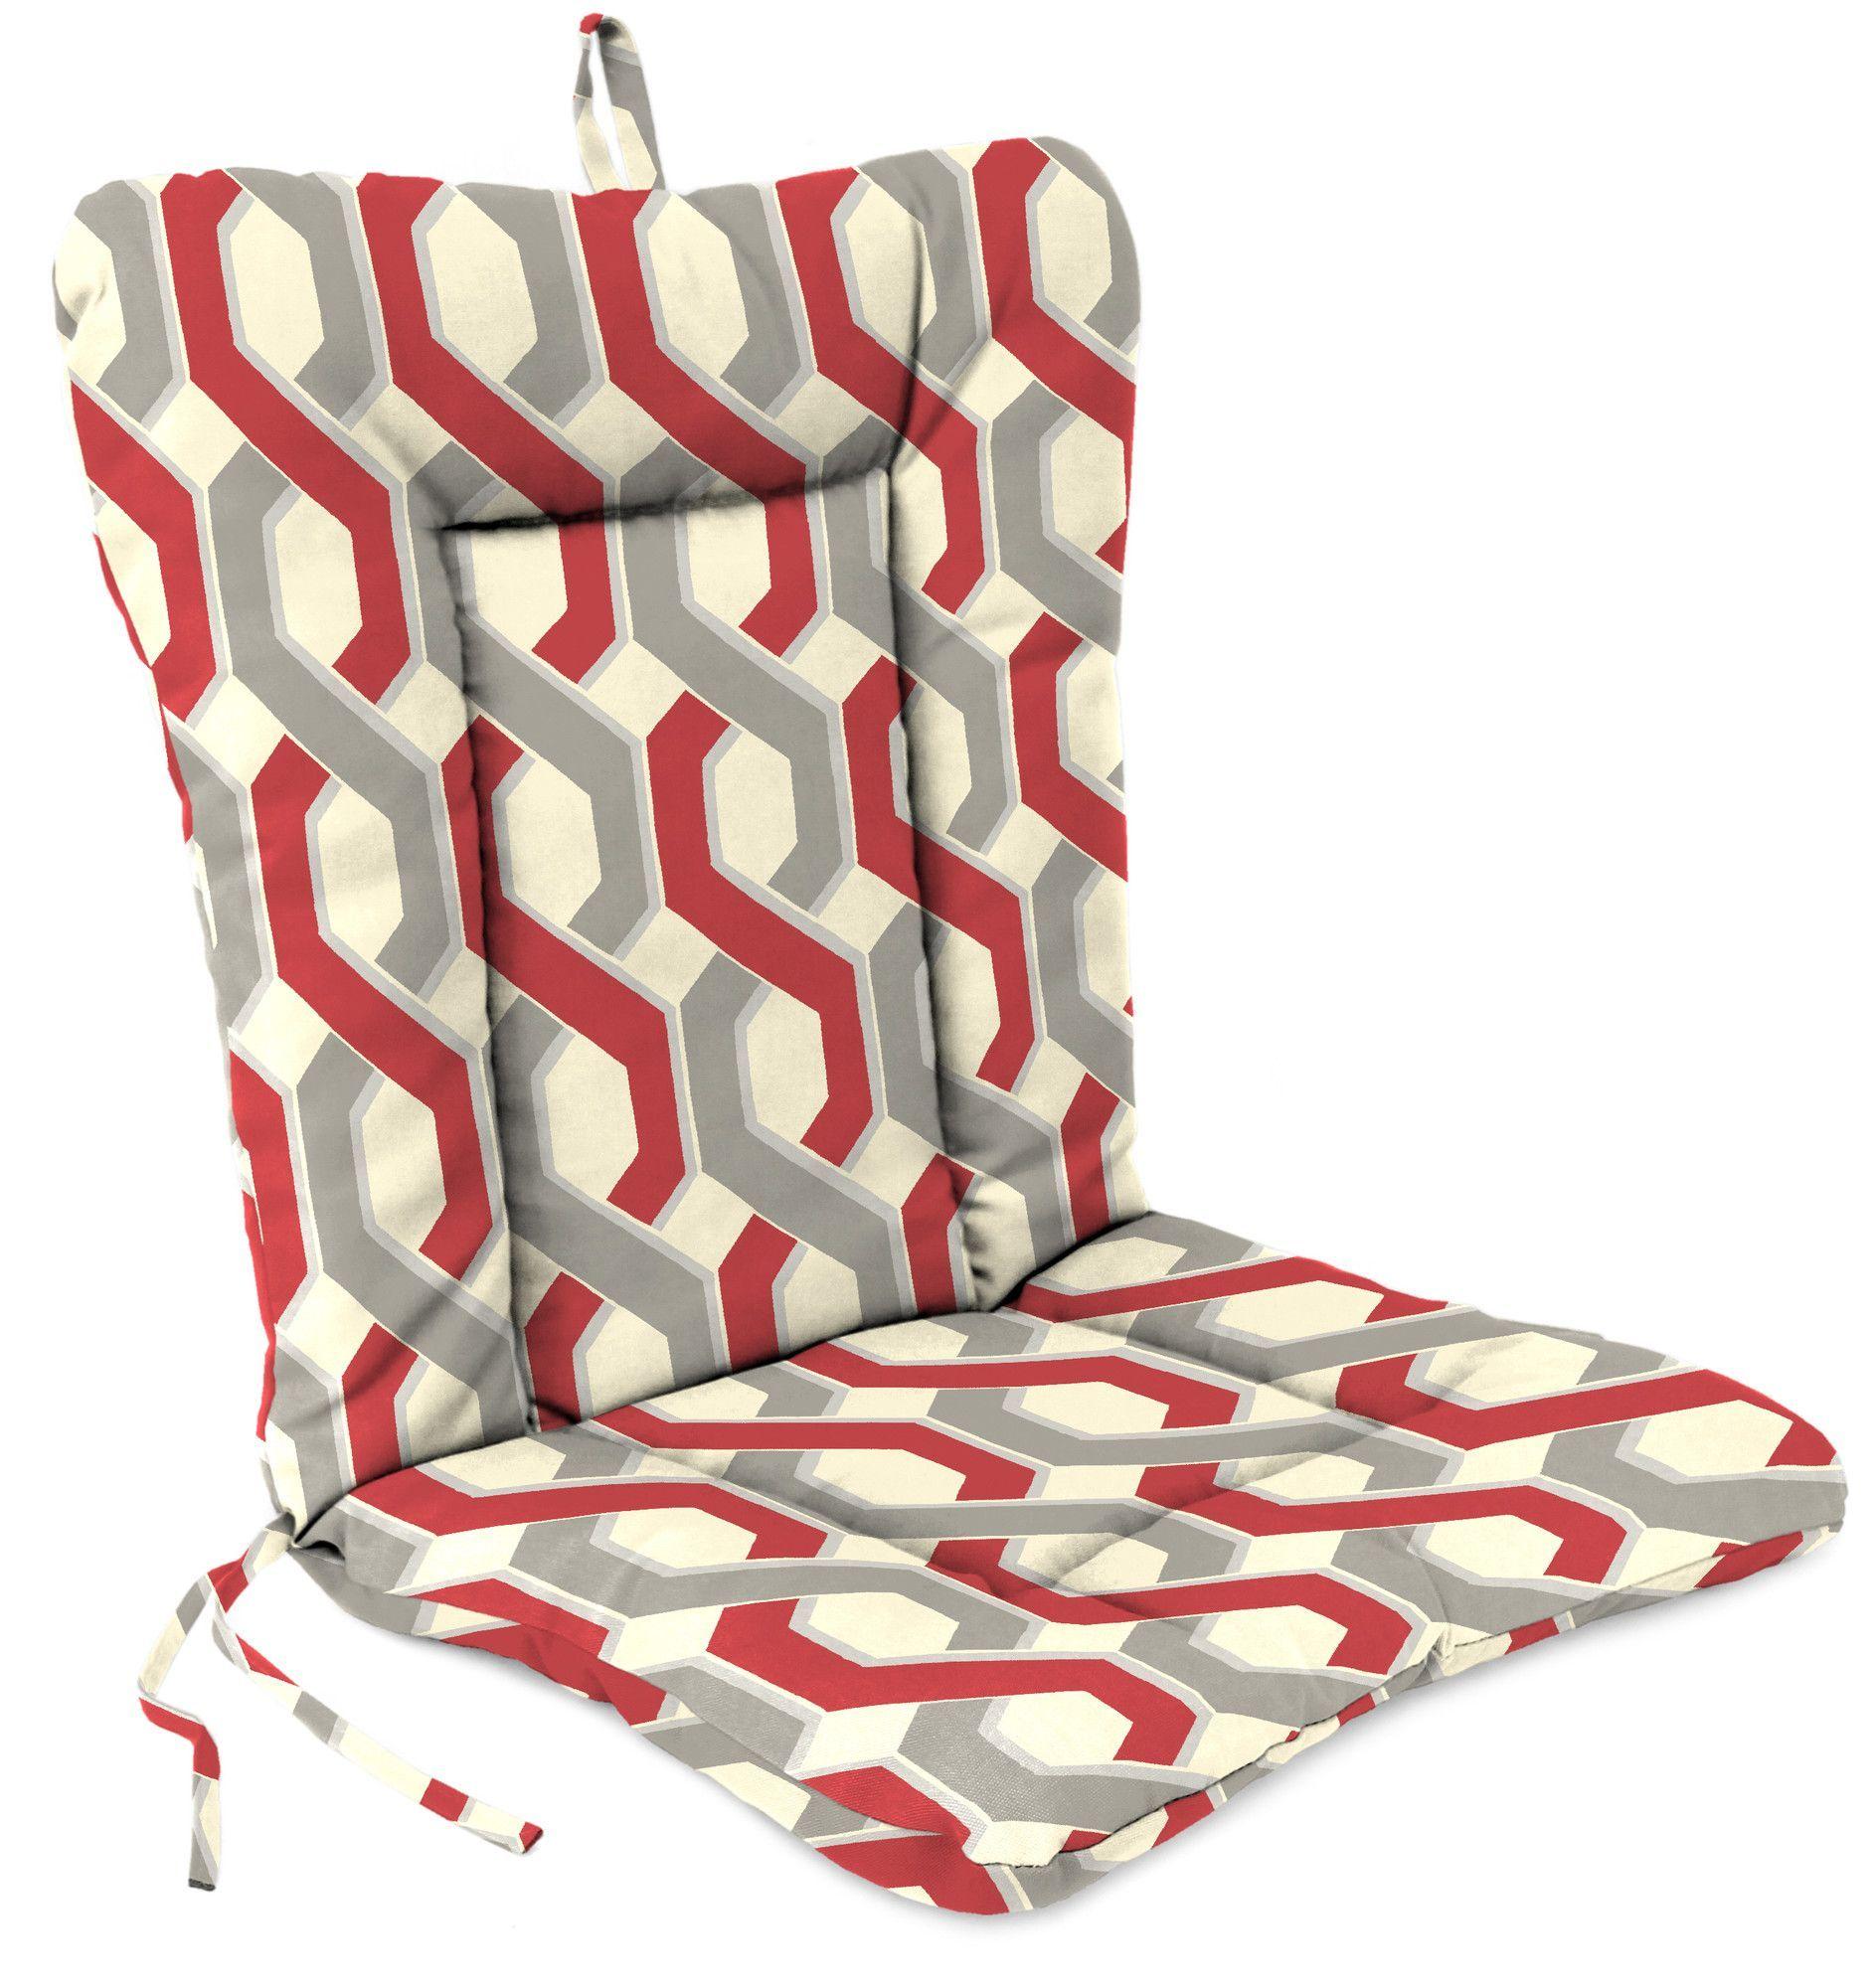 Jordan Manufacturing Outdoor Adirondack Chair Cushion Chair Cushions Adirondack Chair Cushions Adirondack Chair